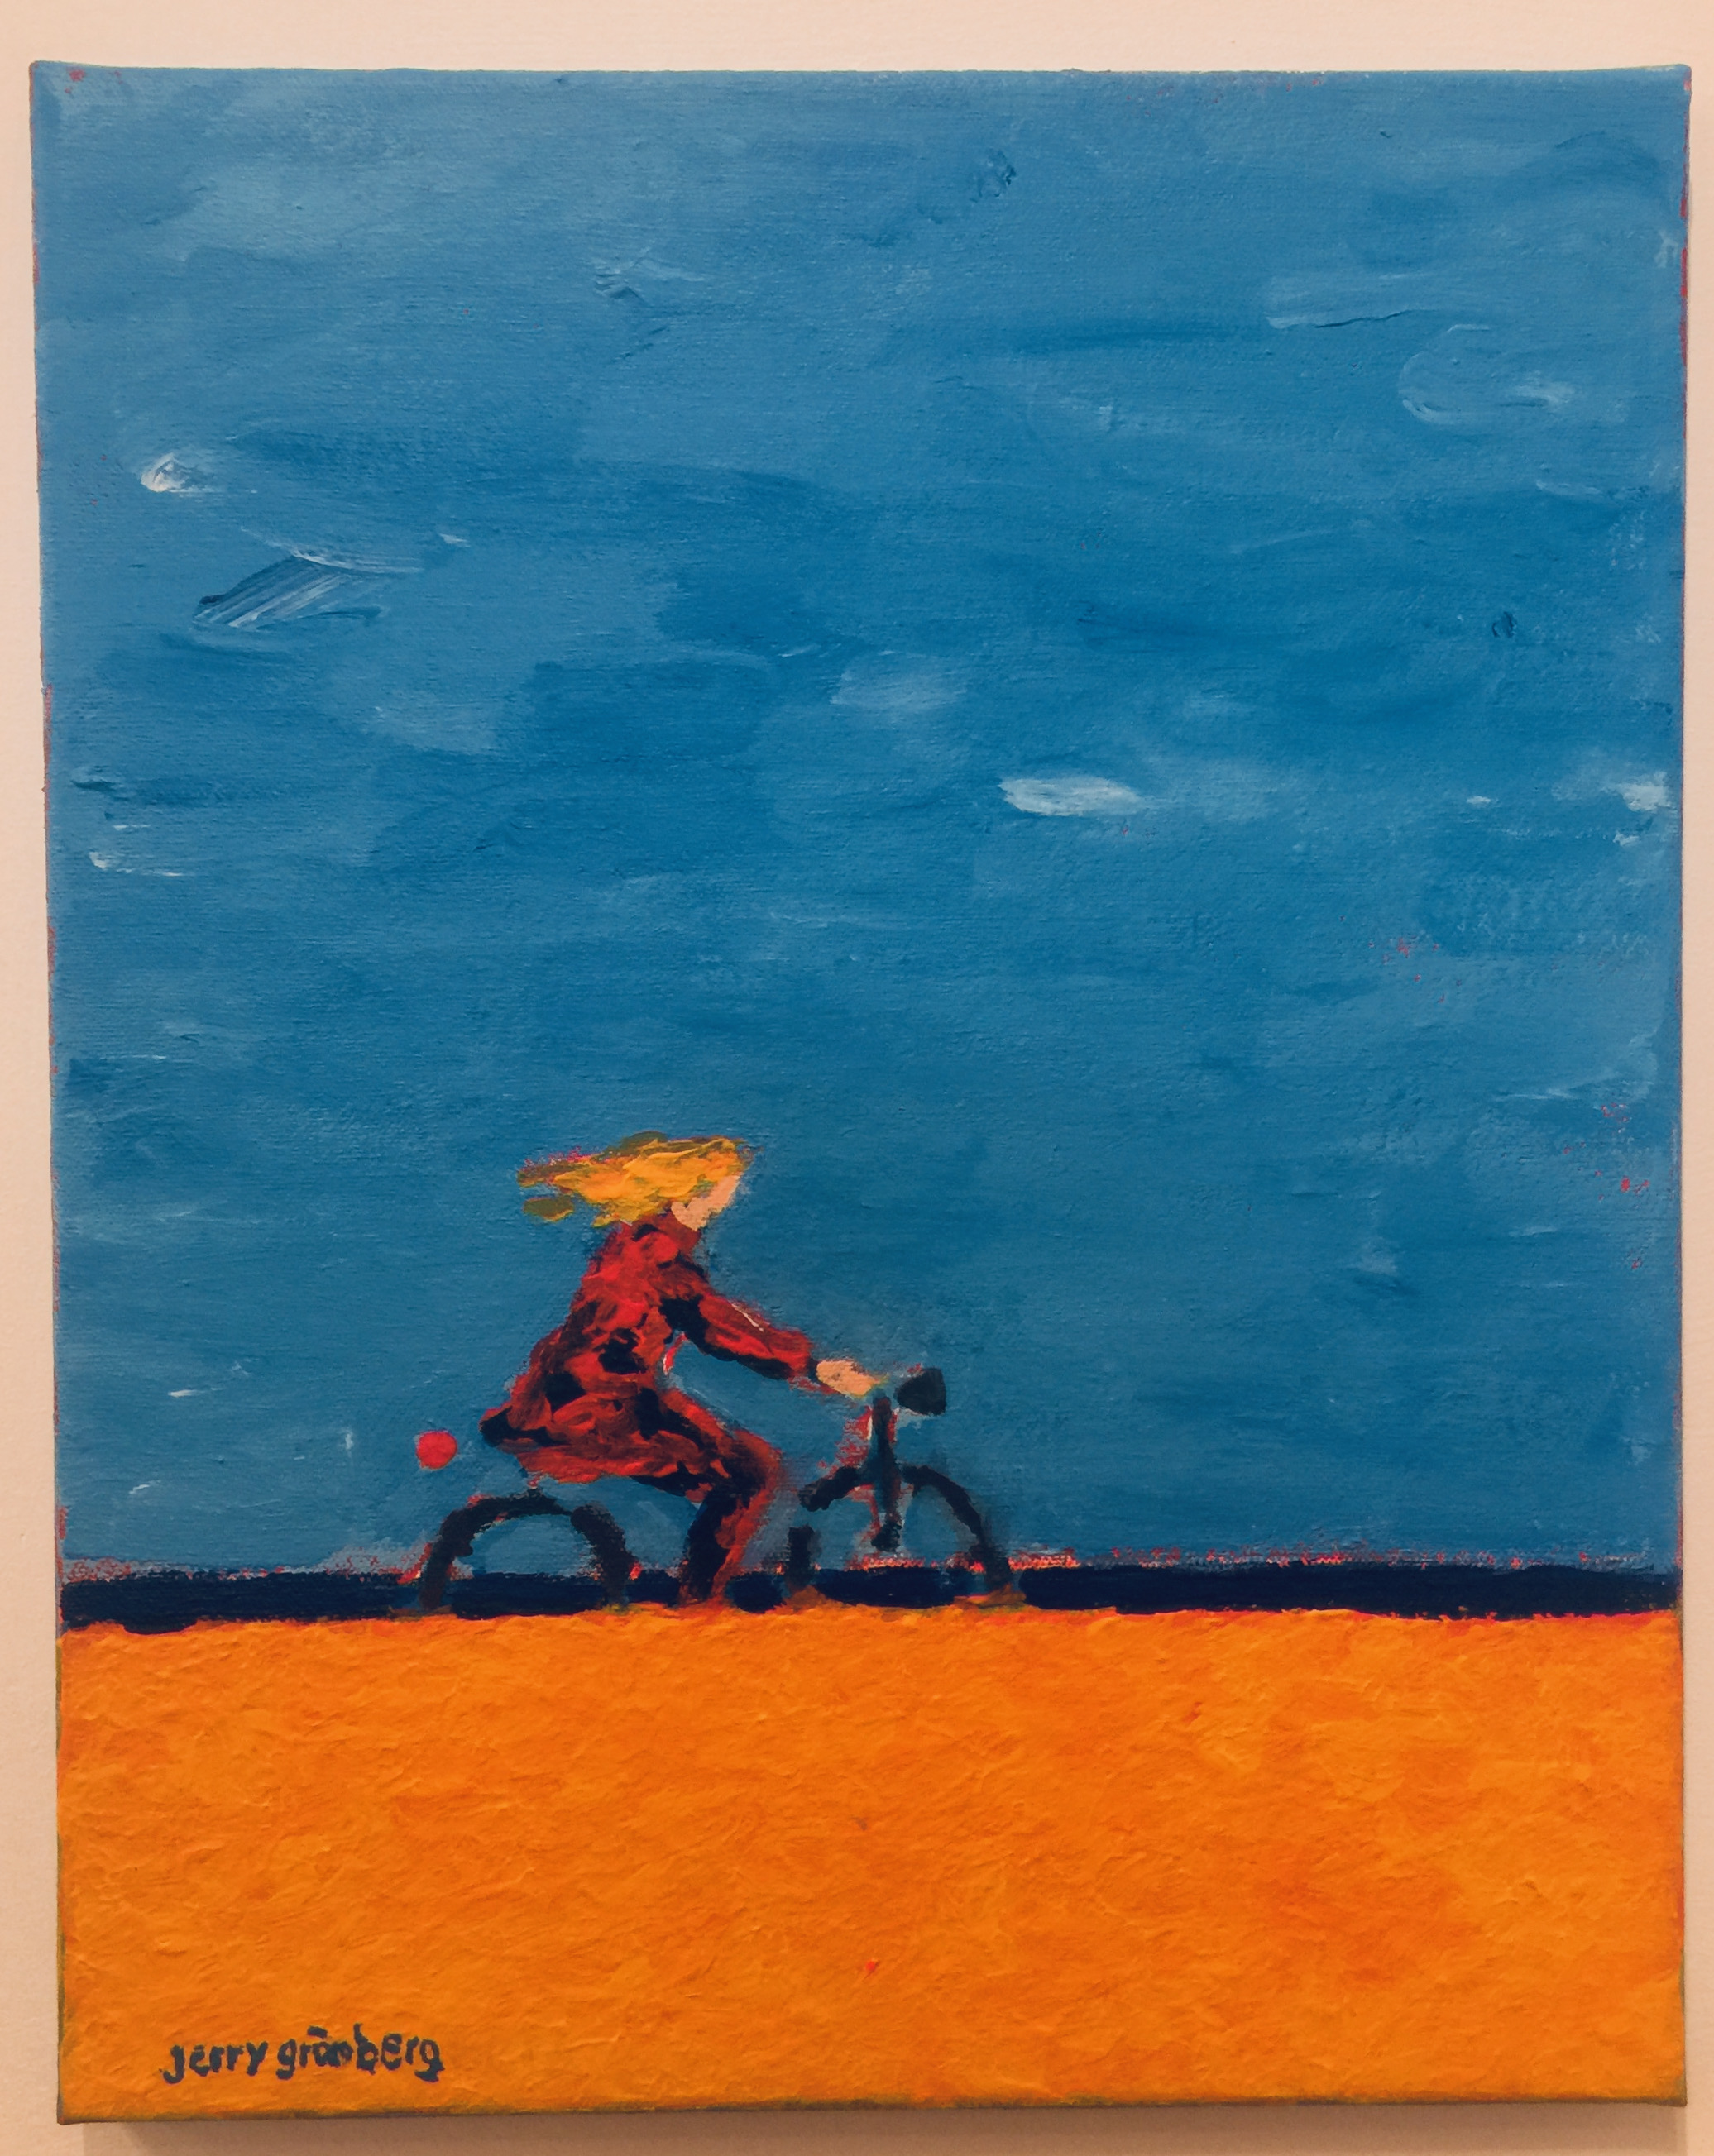 Jerry Grönberg - 'Med vinden i sitt hår', akryl på duk.